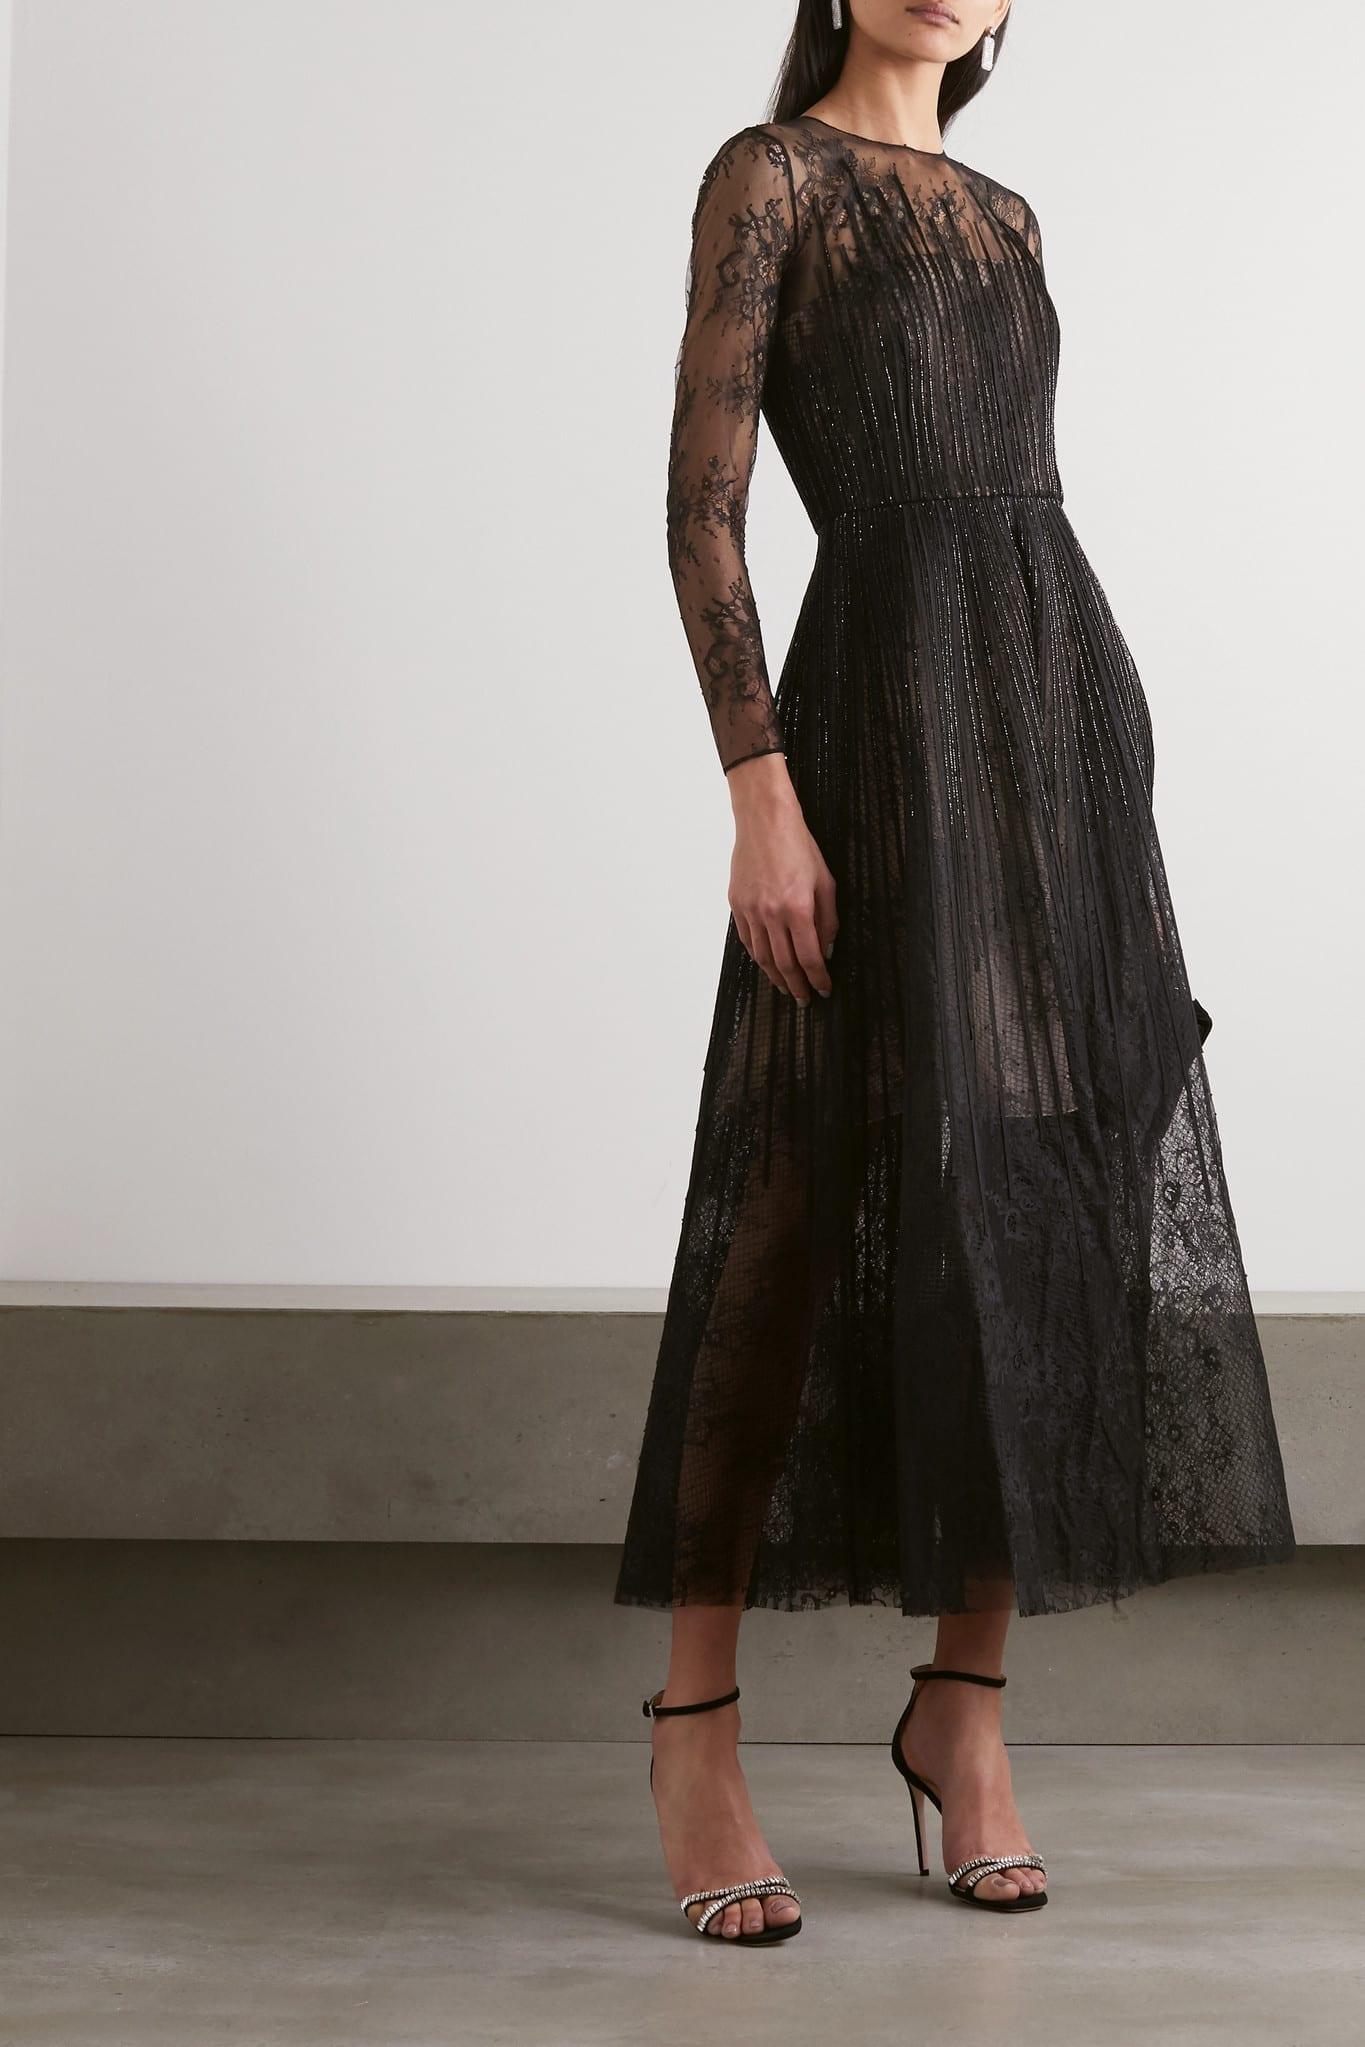 OSCAR DE LA RENTA Bead-embellished Lace And Organza Gown